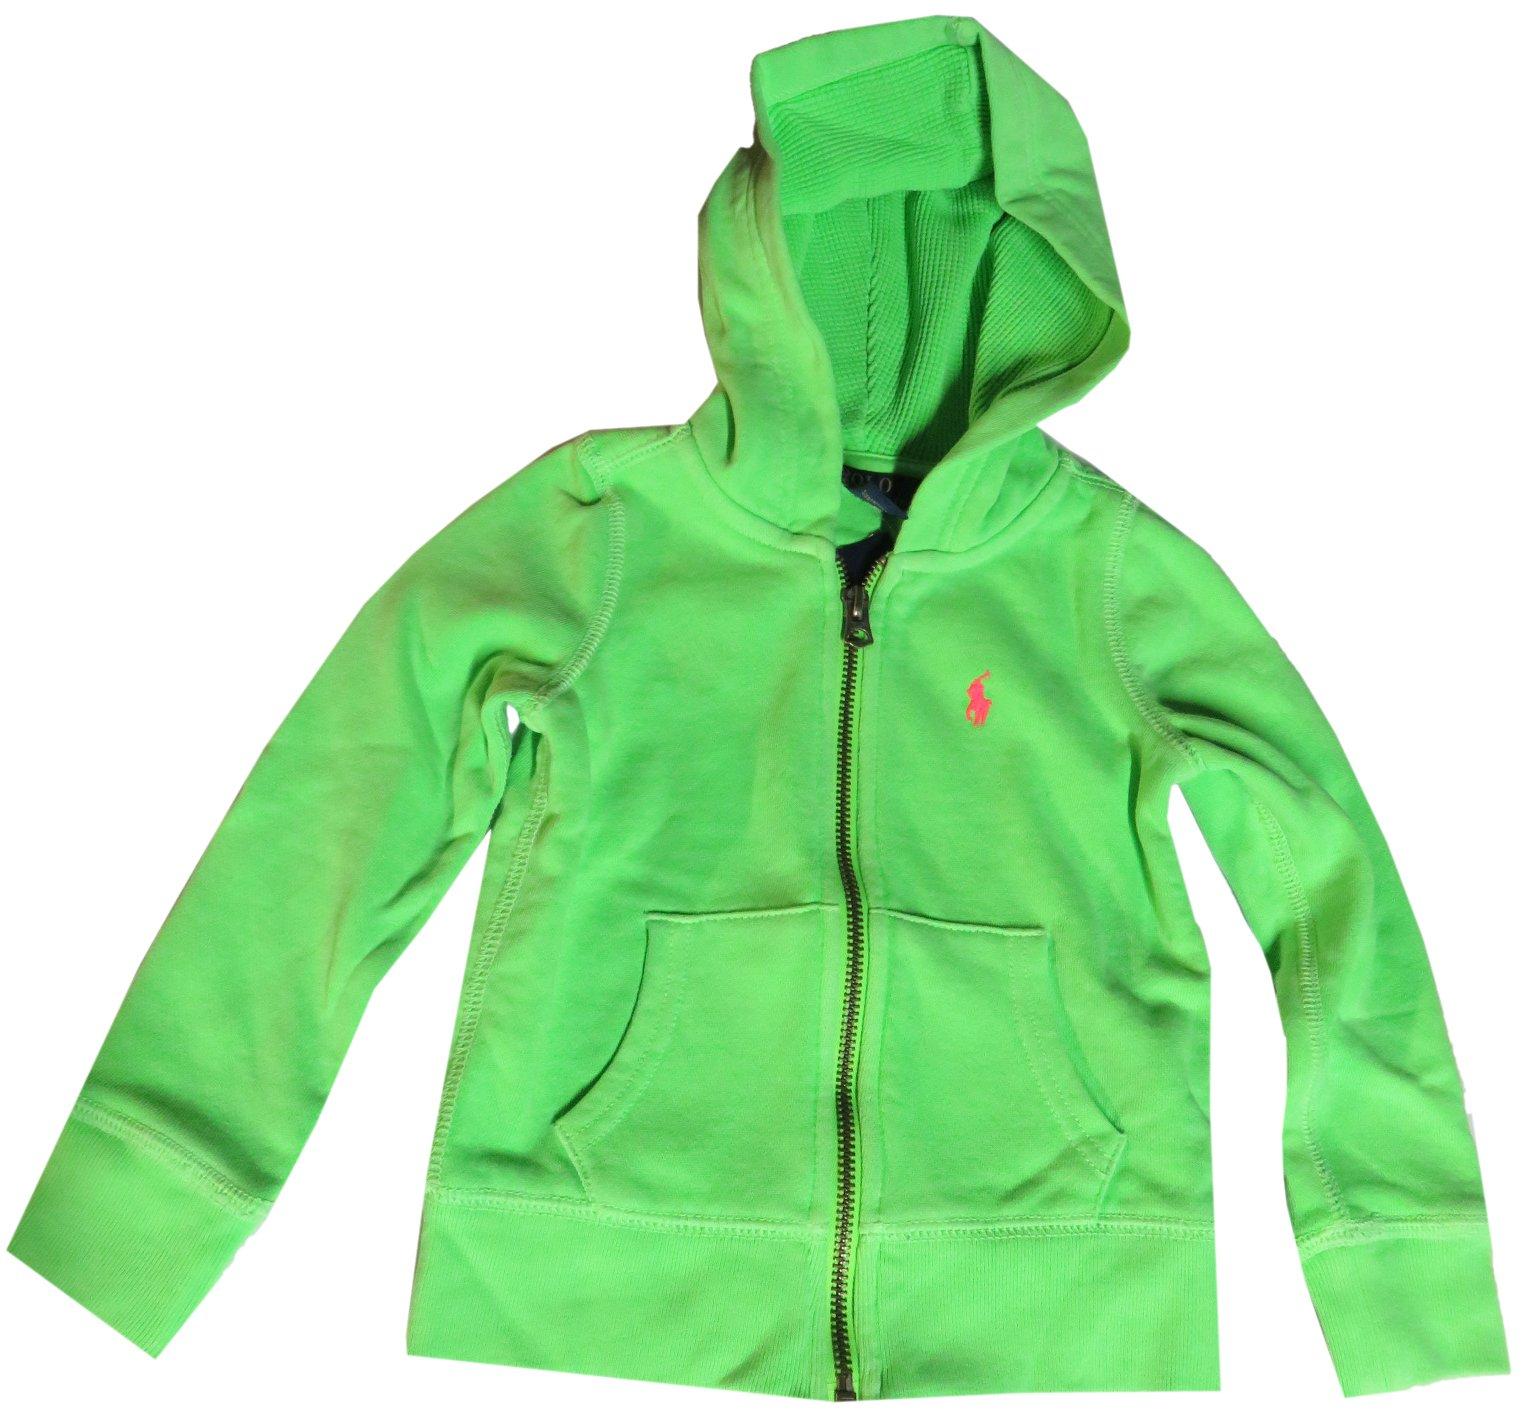 Ralph Lauren Polo Girl's Hooded Sweat Jacket Hoodie Brilliant Green (2T)